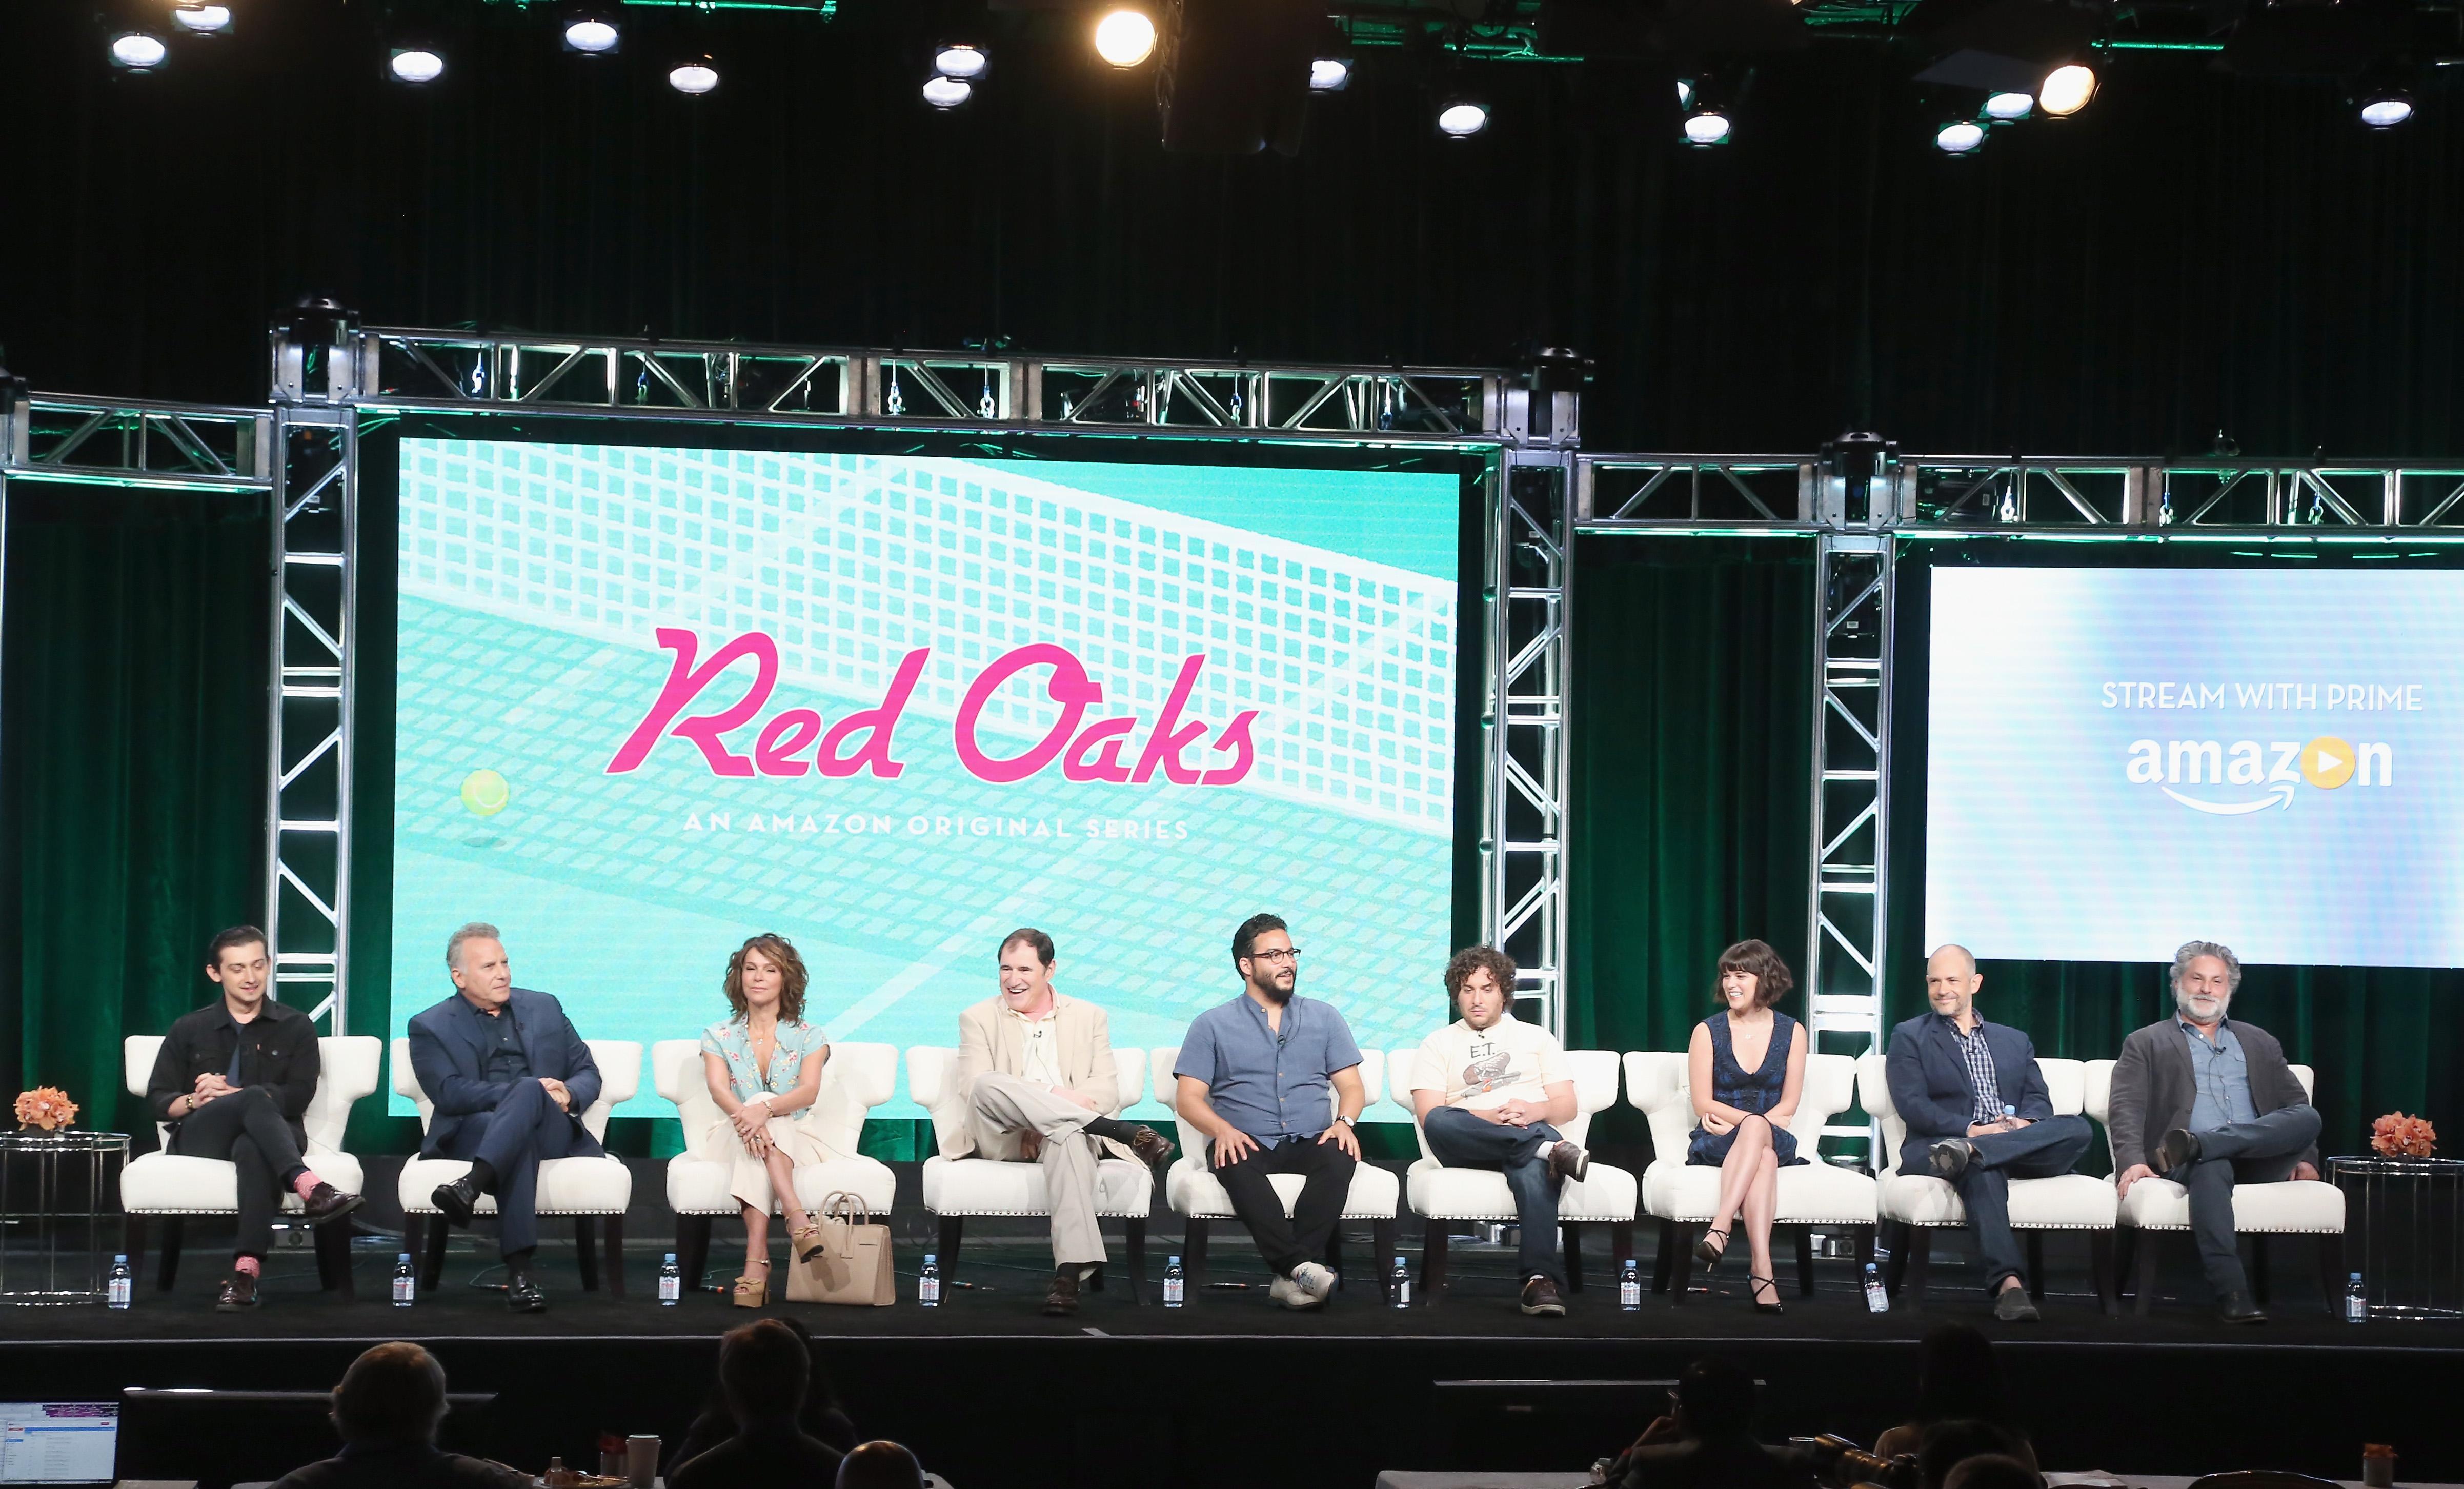 50 best tv shows on amazon prime video  red oaks season 2